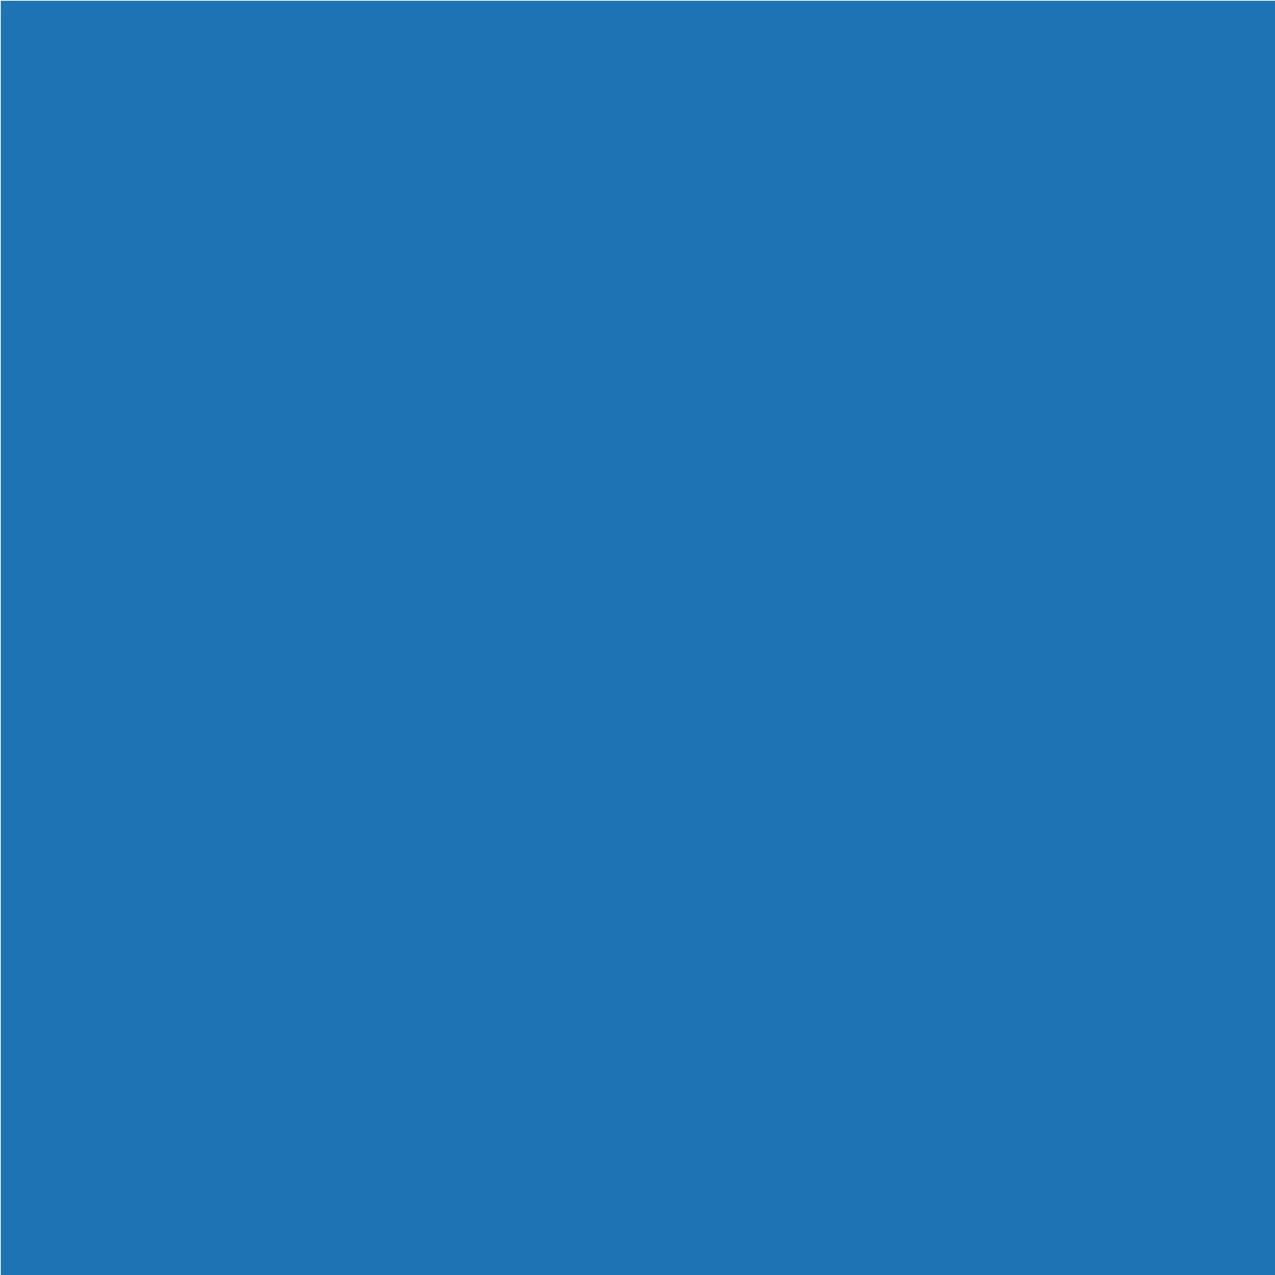 1e73b4 Logo Blue.jpg